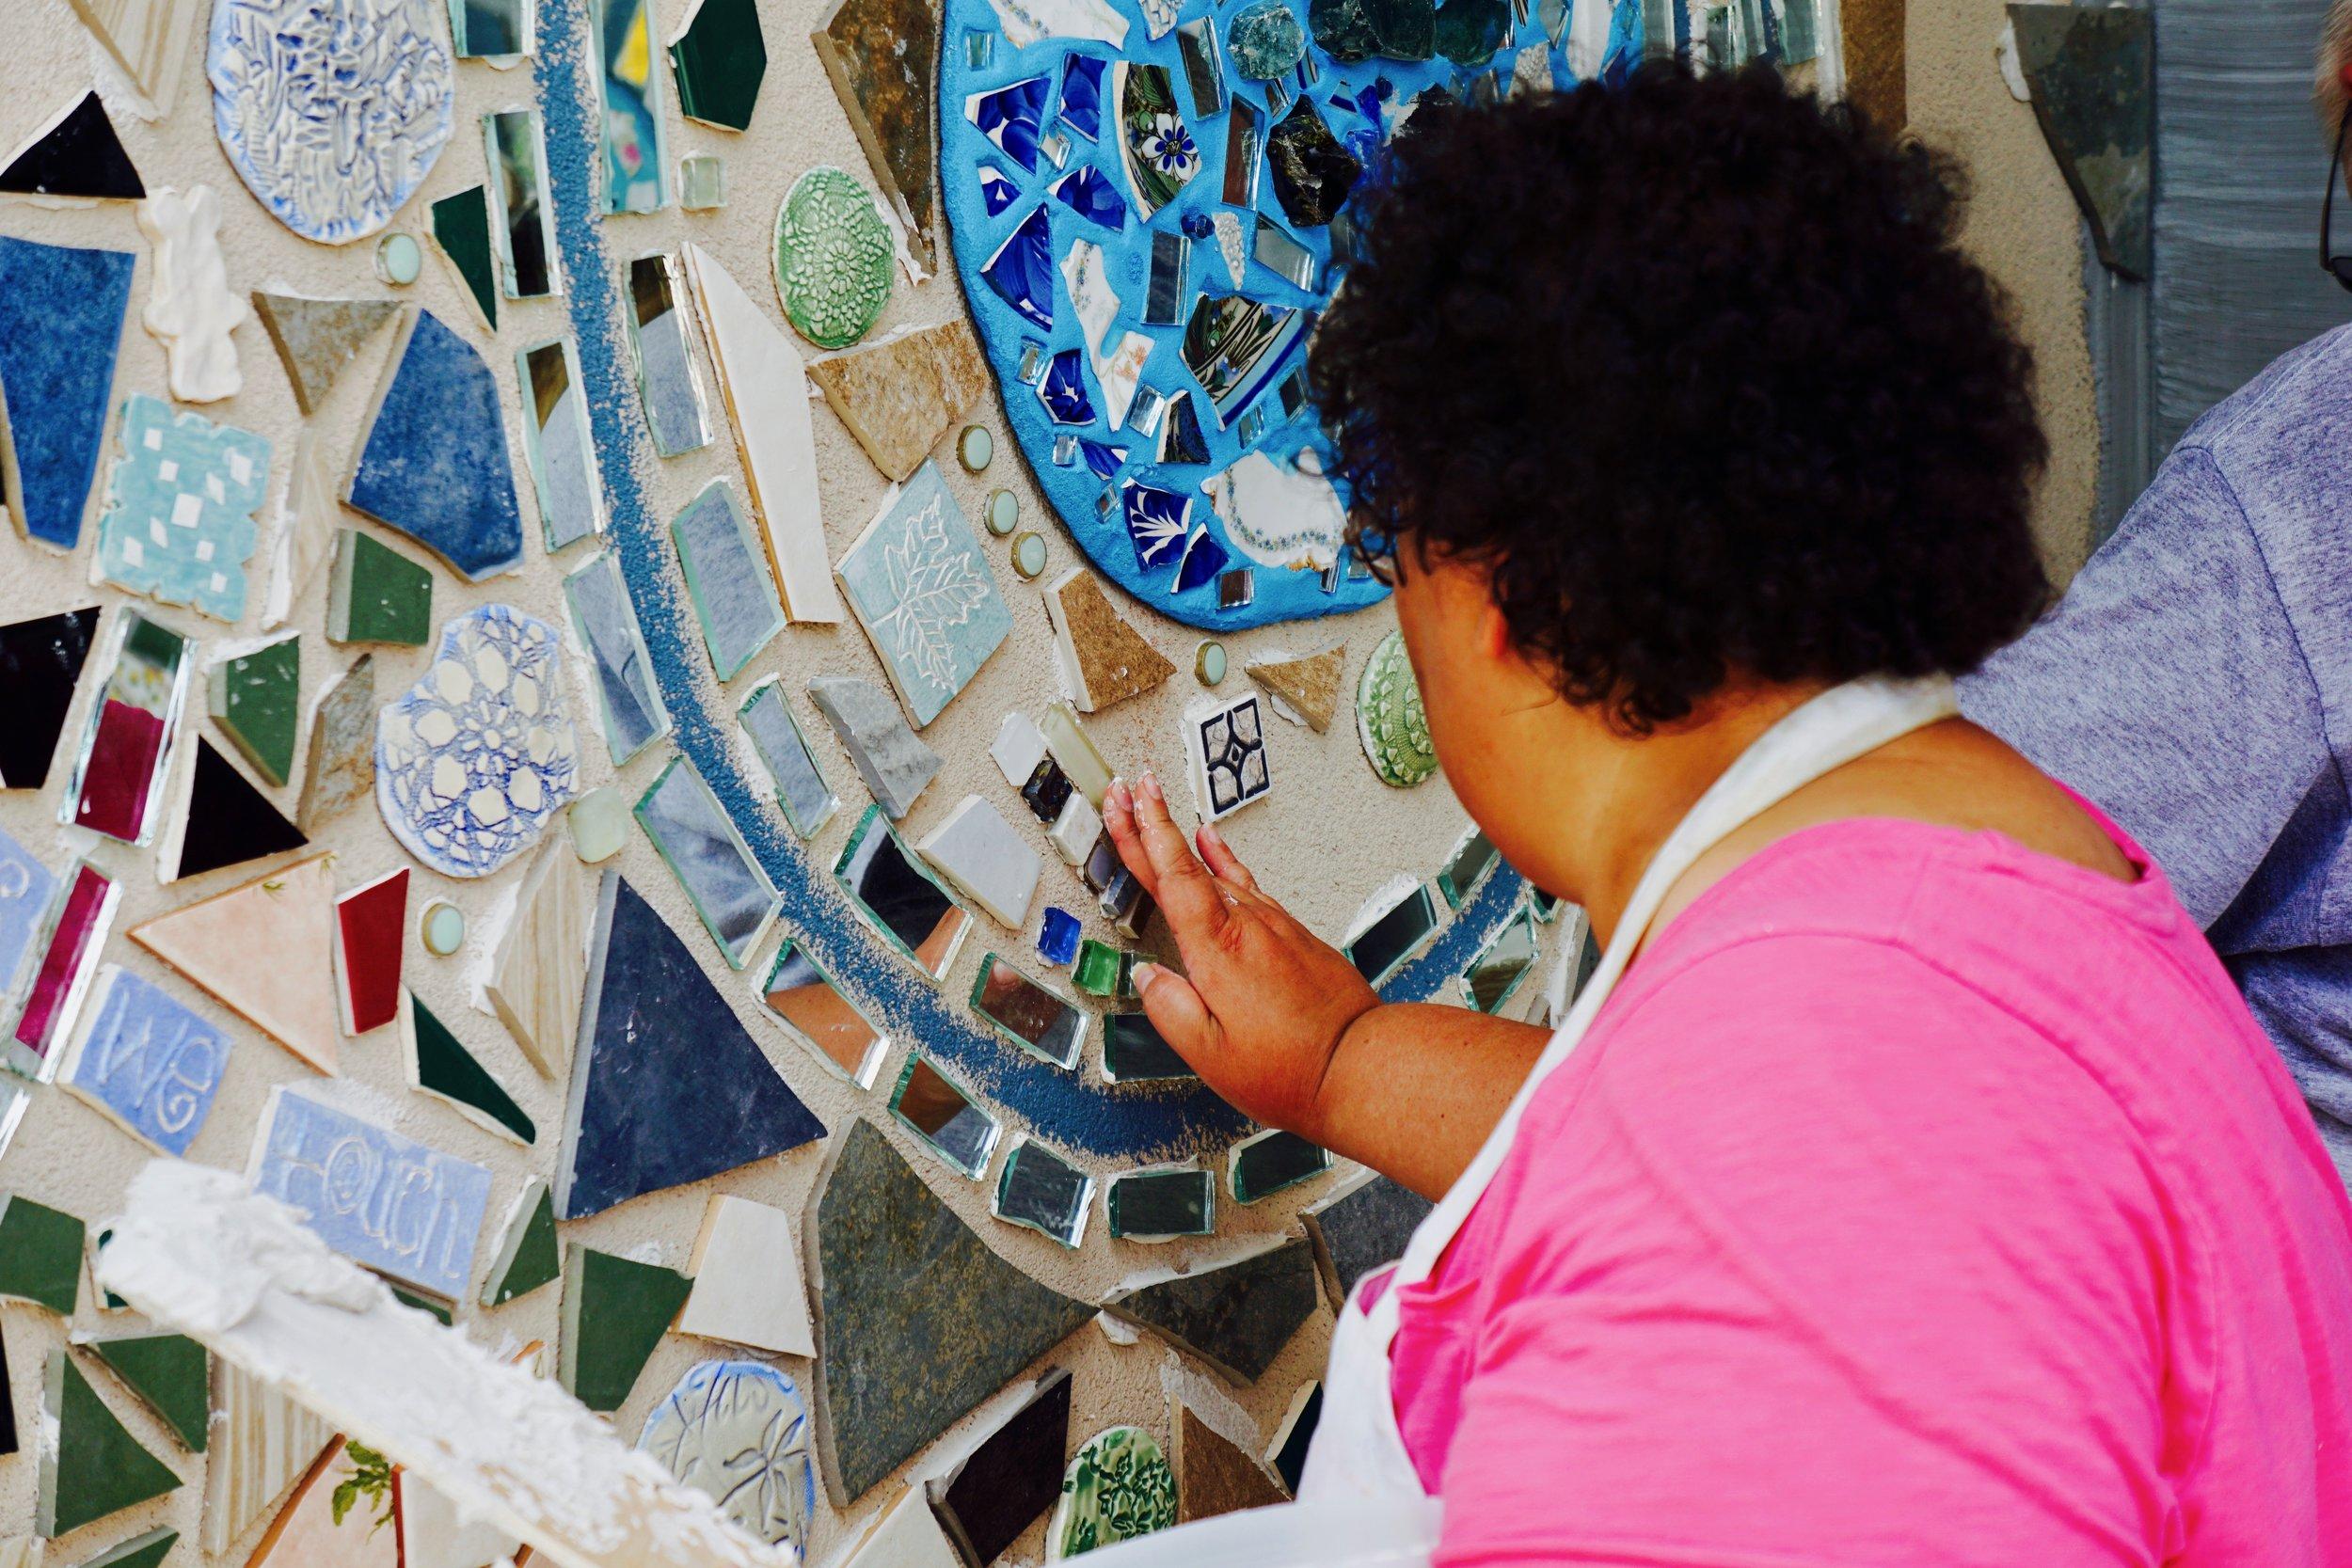 Isaiah Zagar Mosaic Mural for glassboro3.jpg